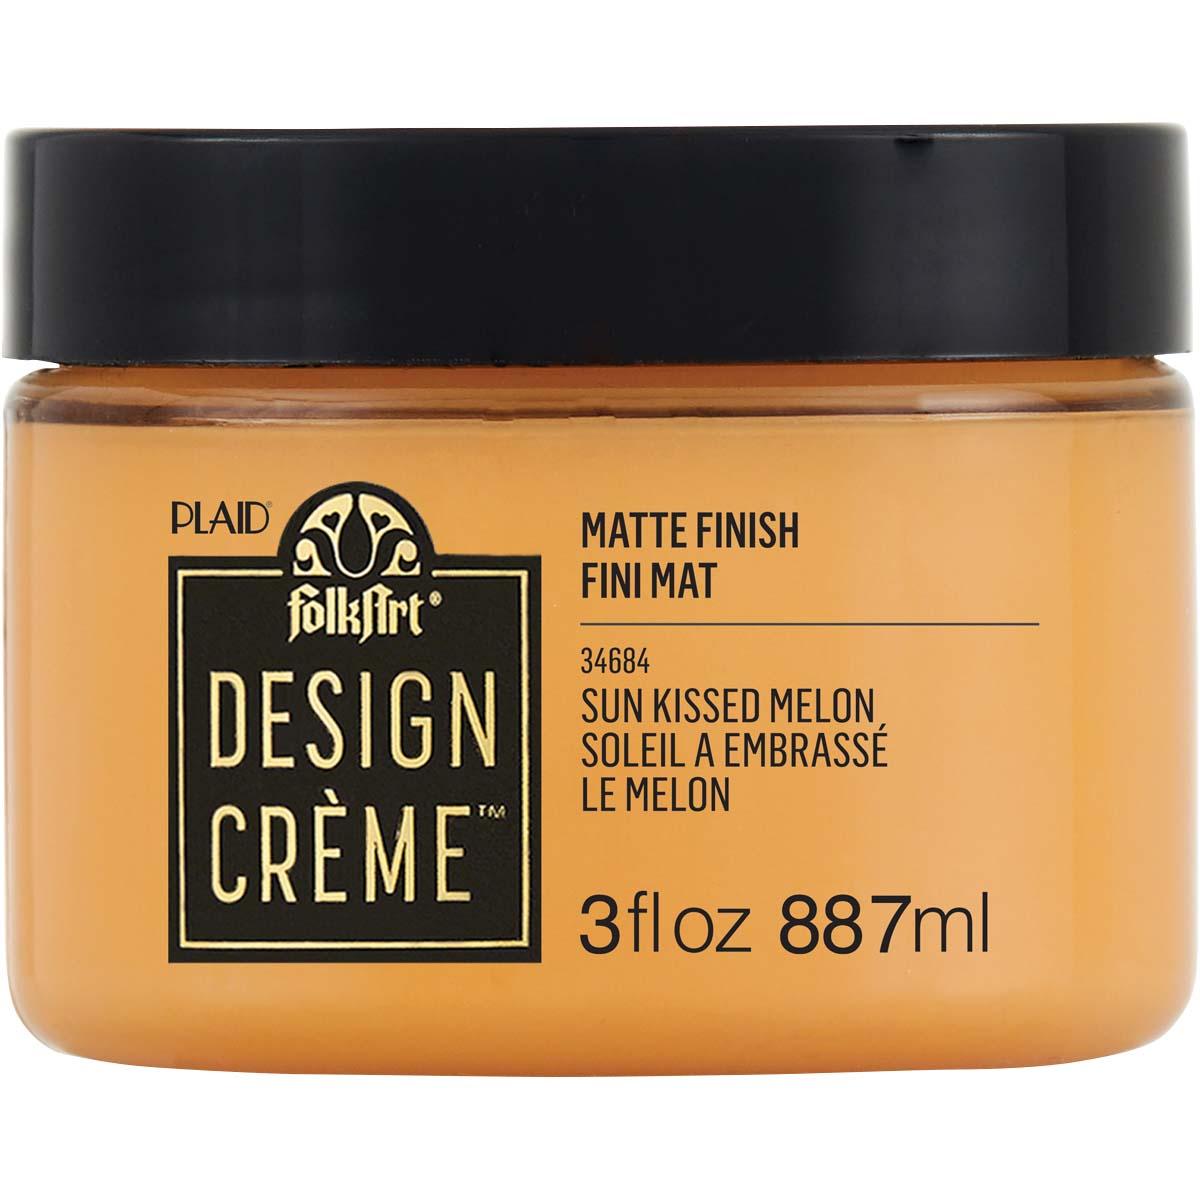 FolkArt ® Design Creme™ - Sun Kissed Melon, 3 oz. - 34684